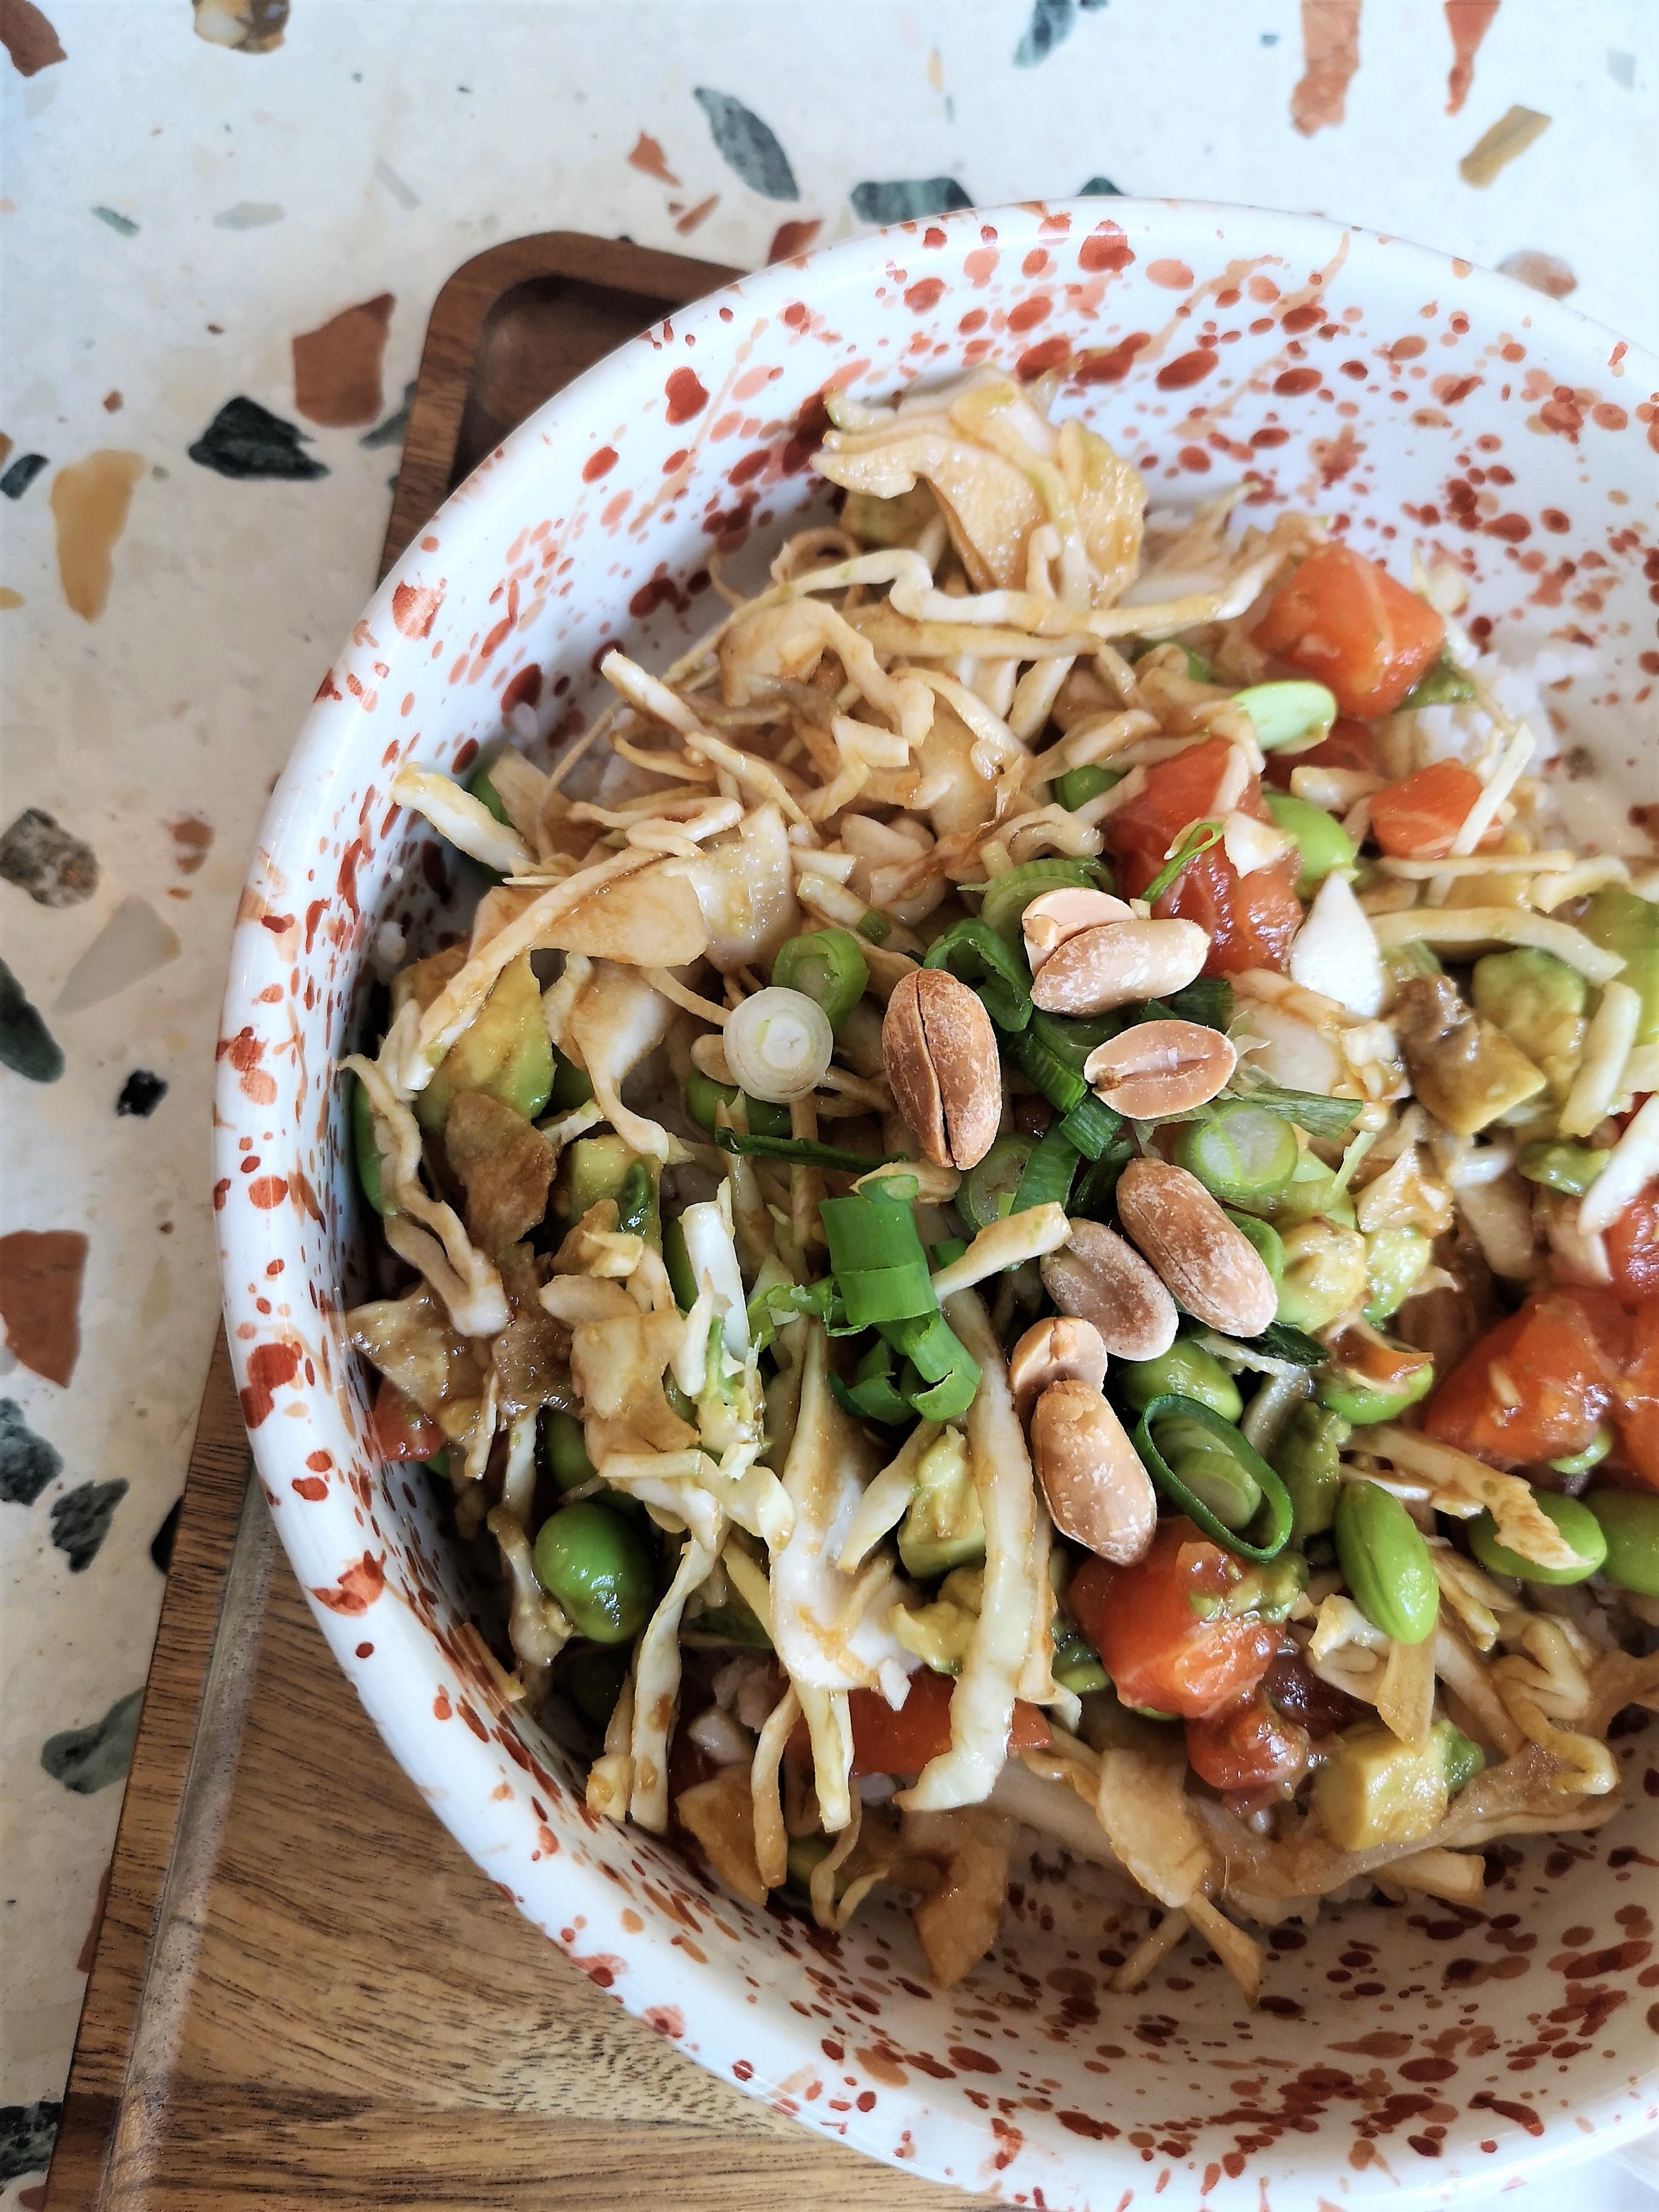 bernard-leon-bowl